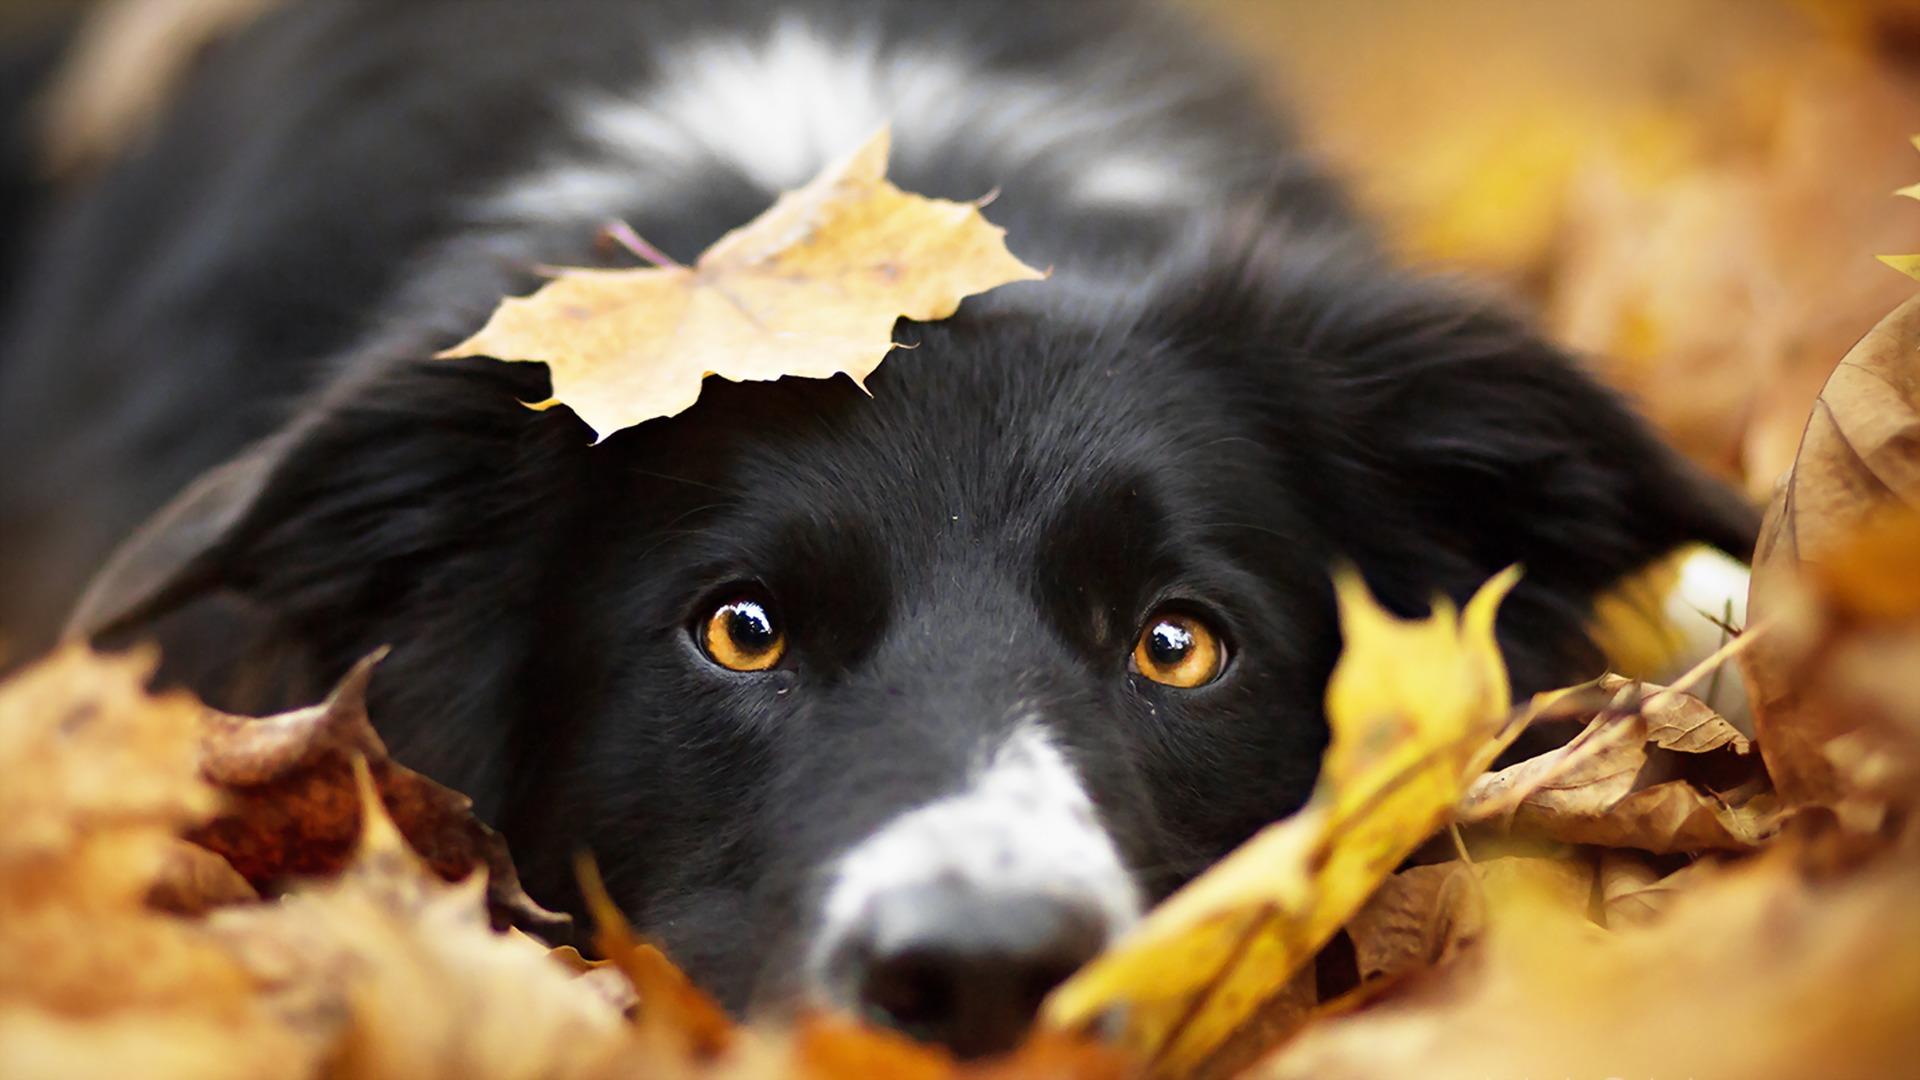 Starostlivosť o psa v jeseni